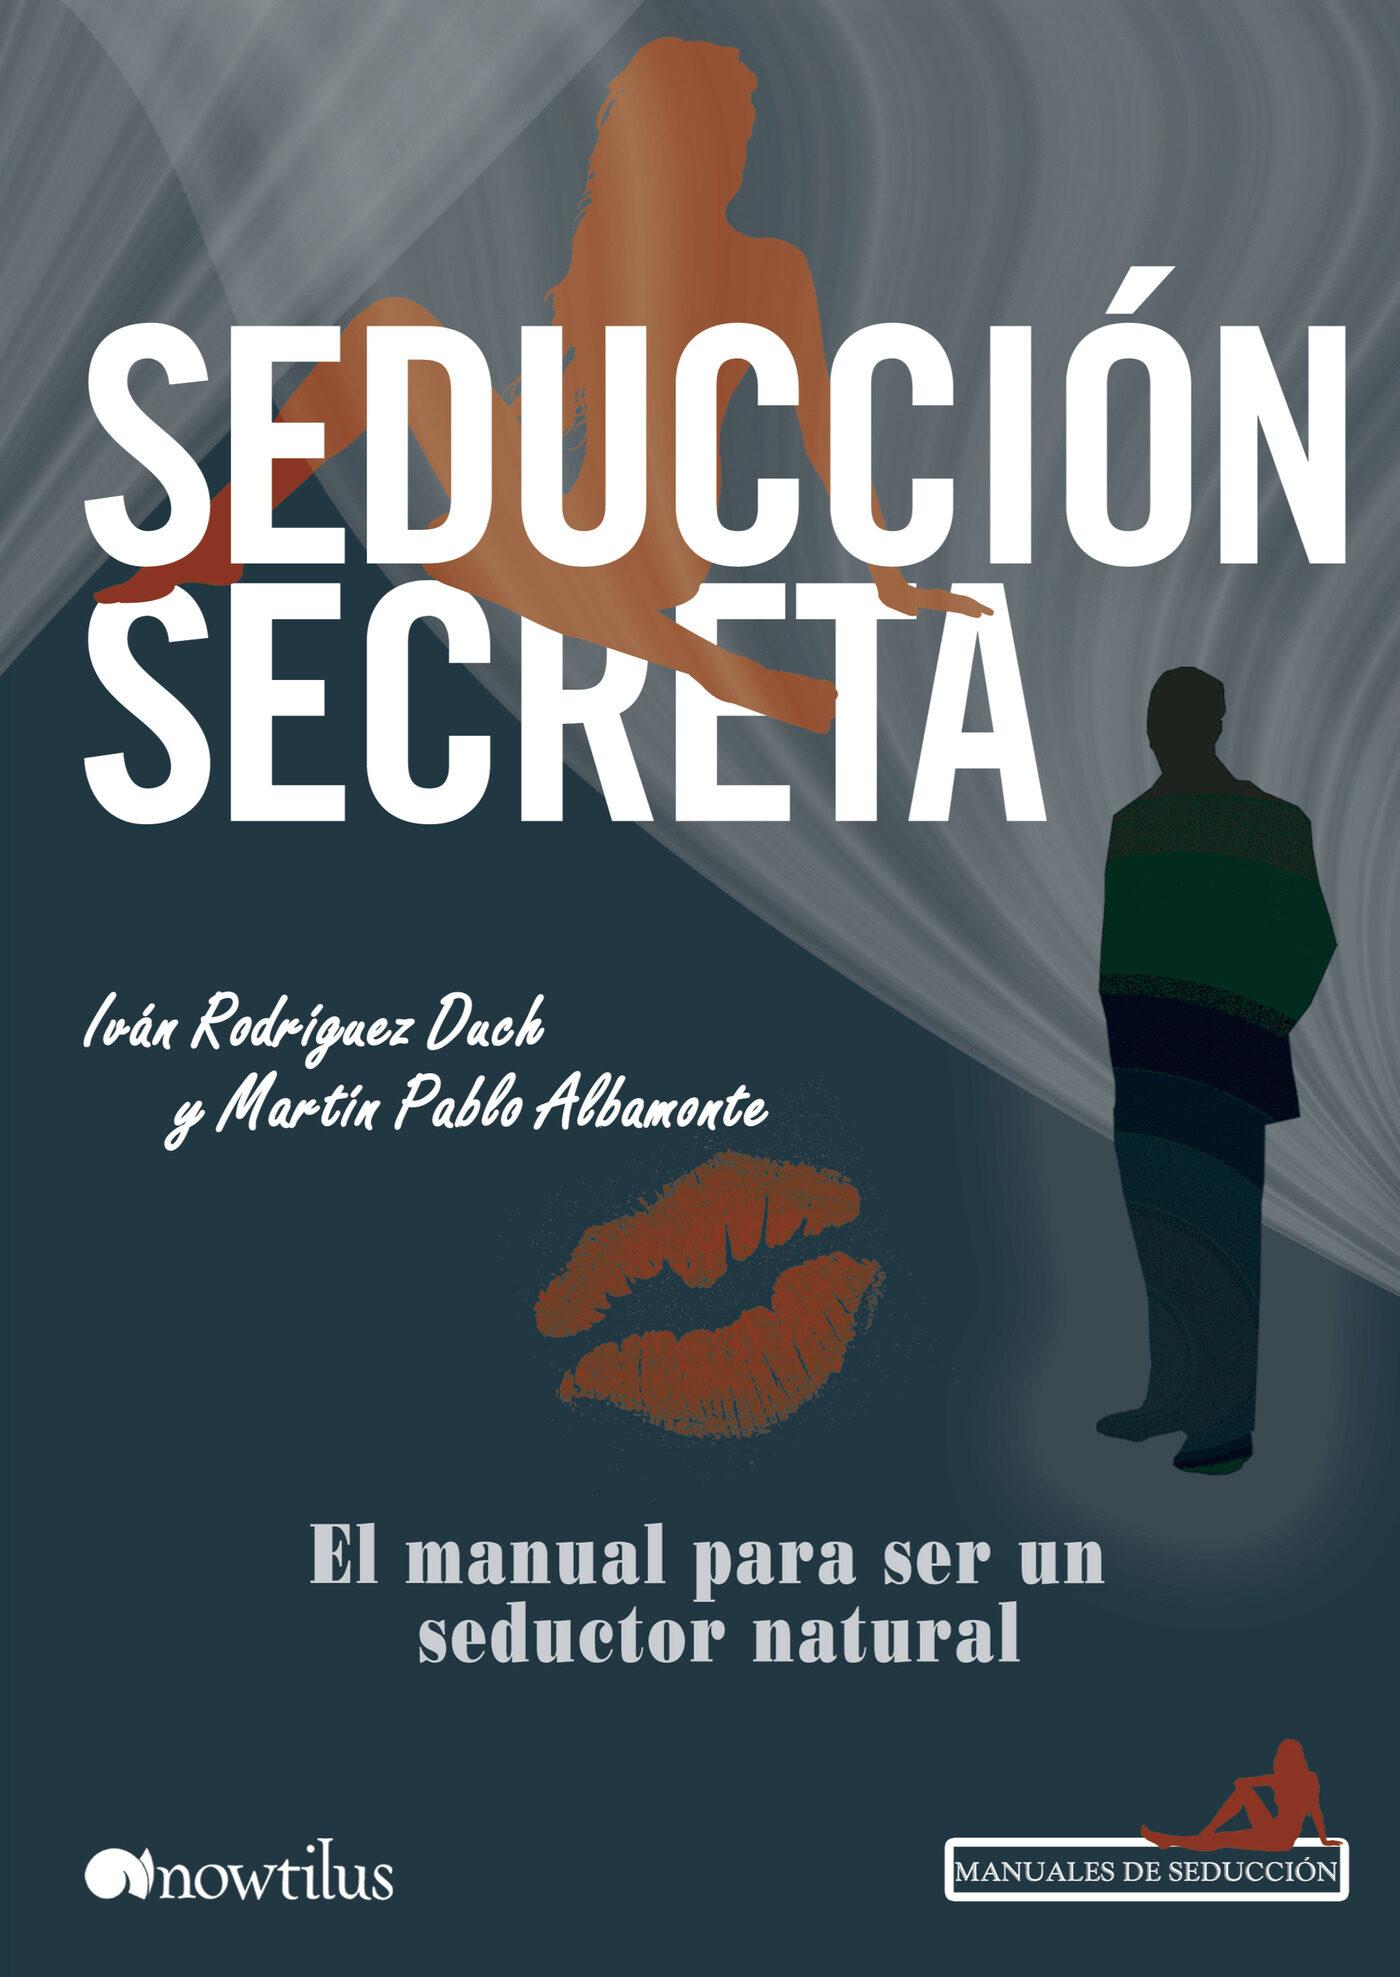 Seducci n secreta ebook ivan rodriguez duch martin pablo albamonte 9788499673509